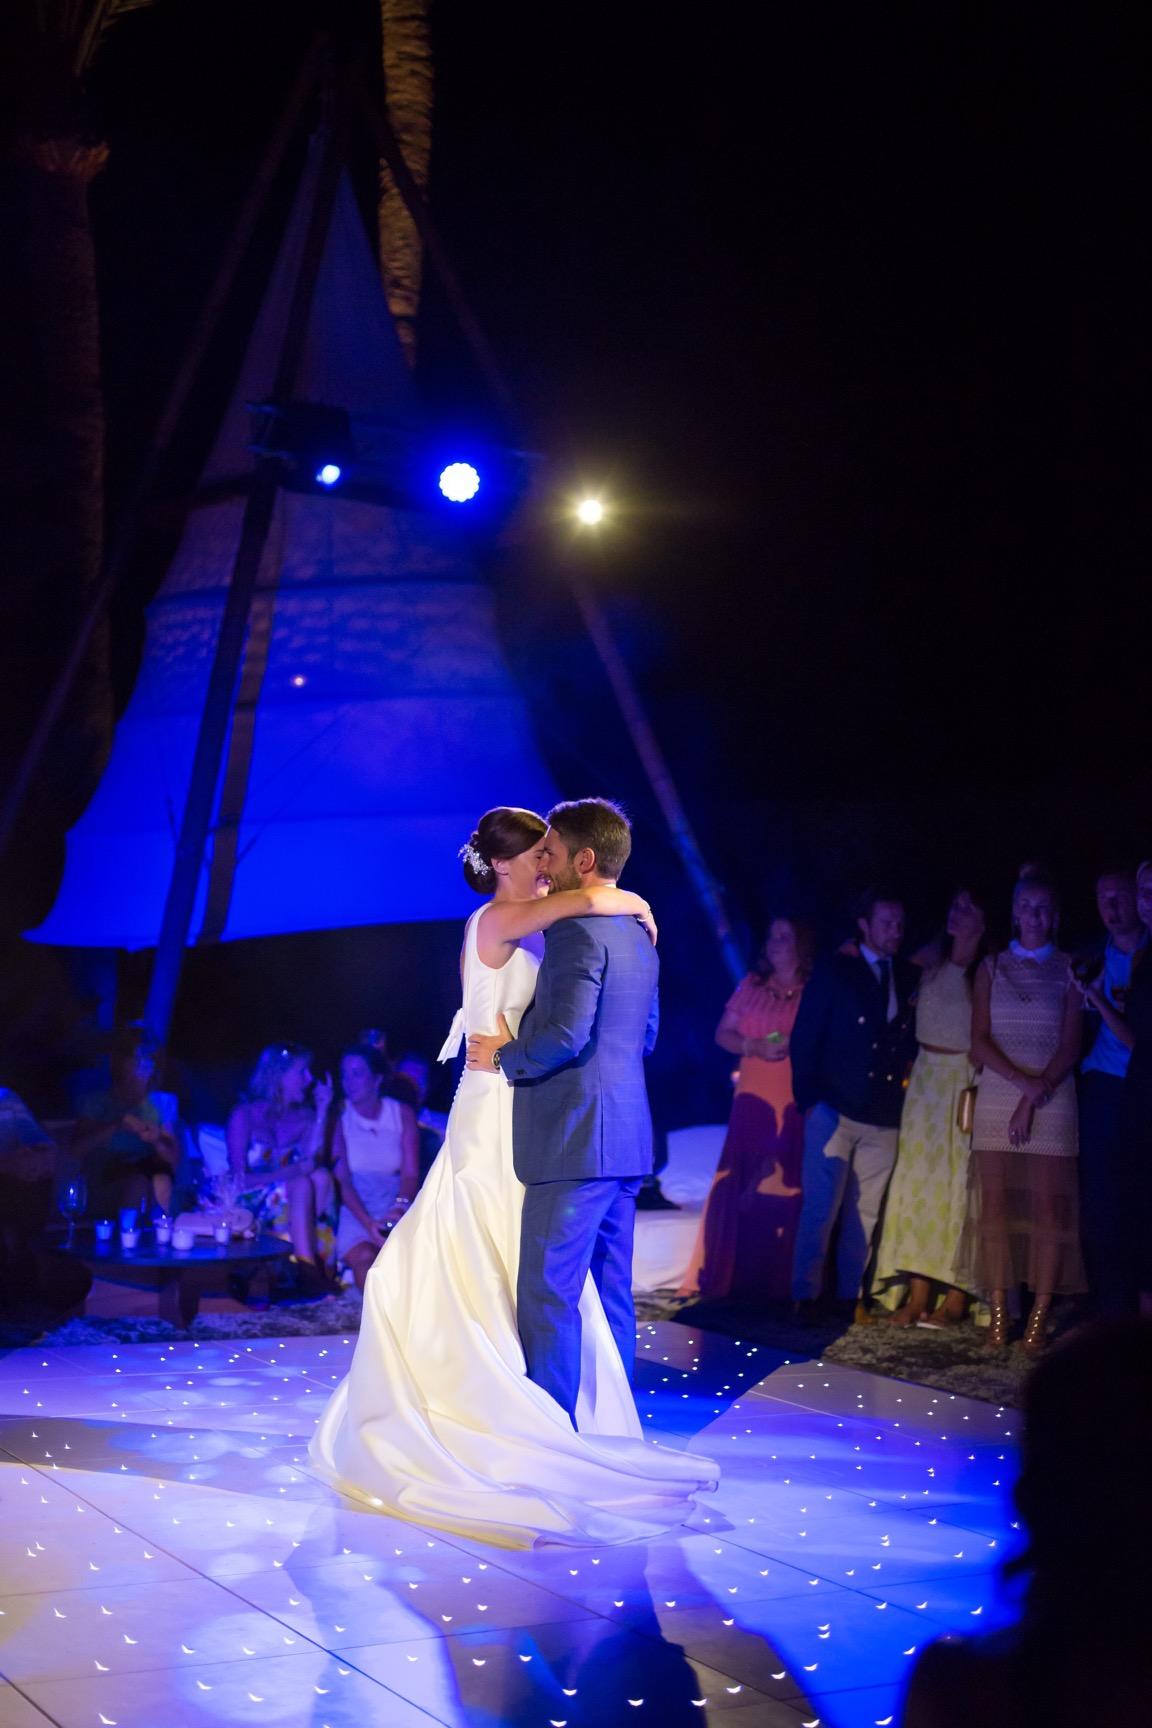 Si-Quiero-Wedding-Planner-By-Sira-Antequera-Bodas-Málaga-Marbella-Miami-2